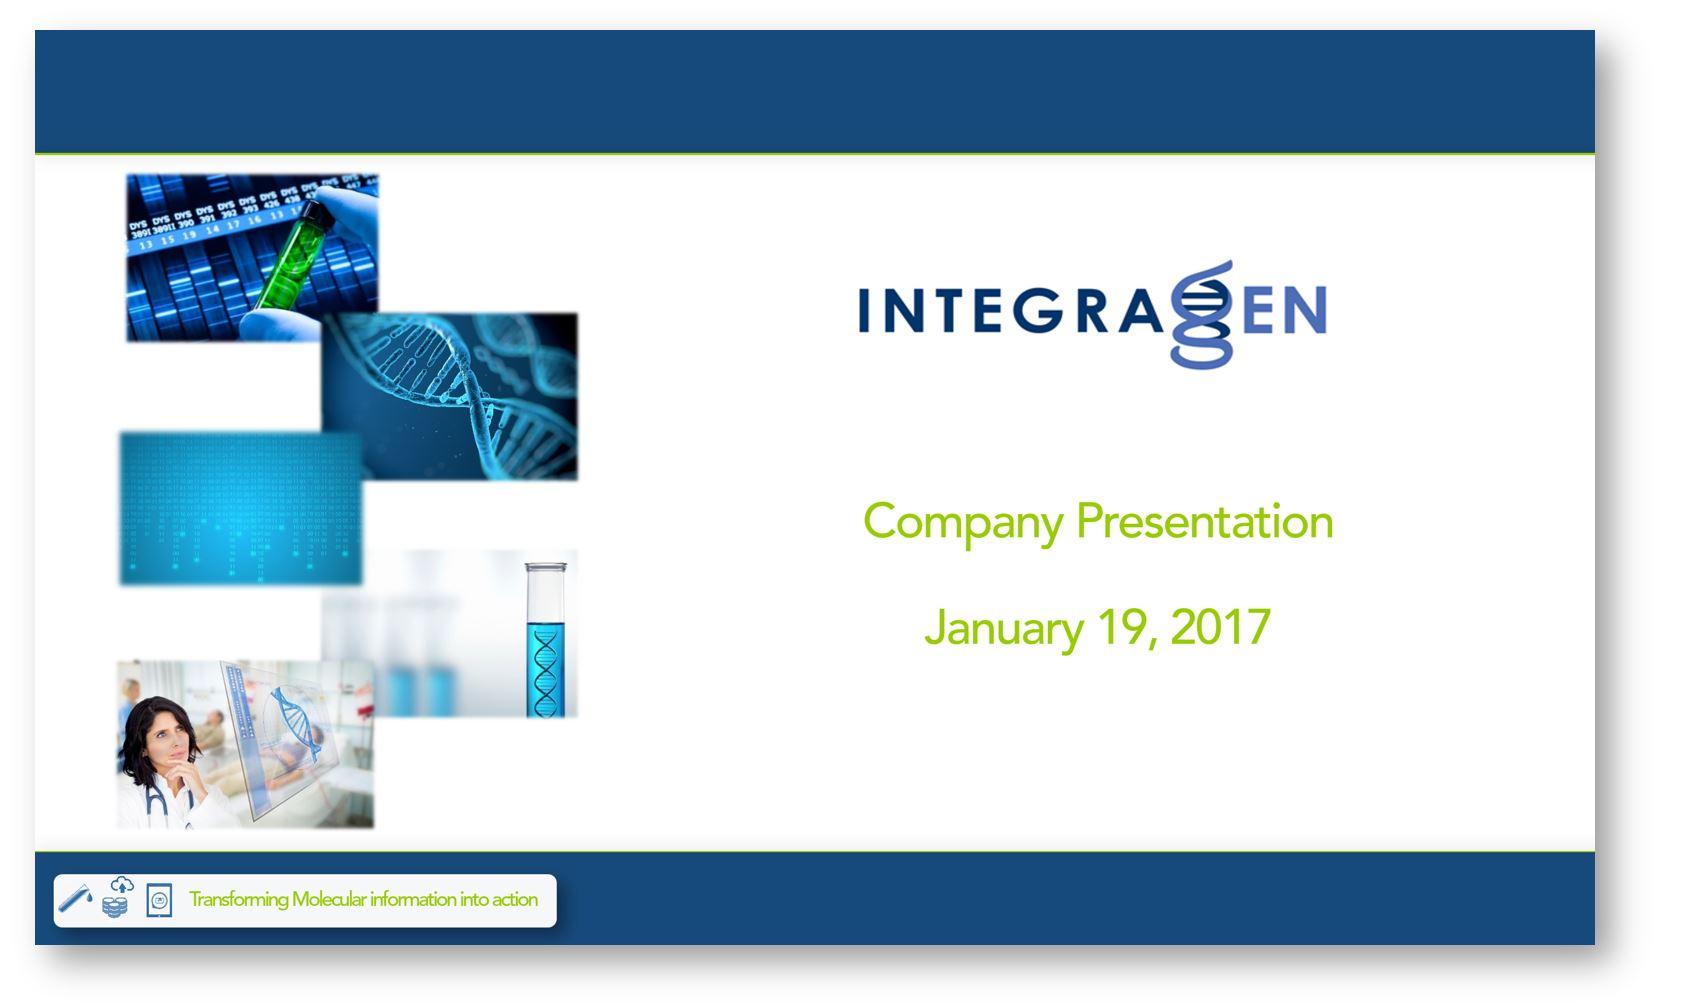 Corporate presentation image 19jan2017